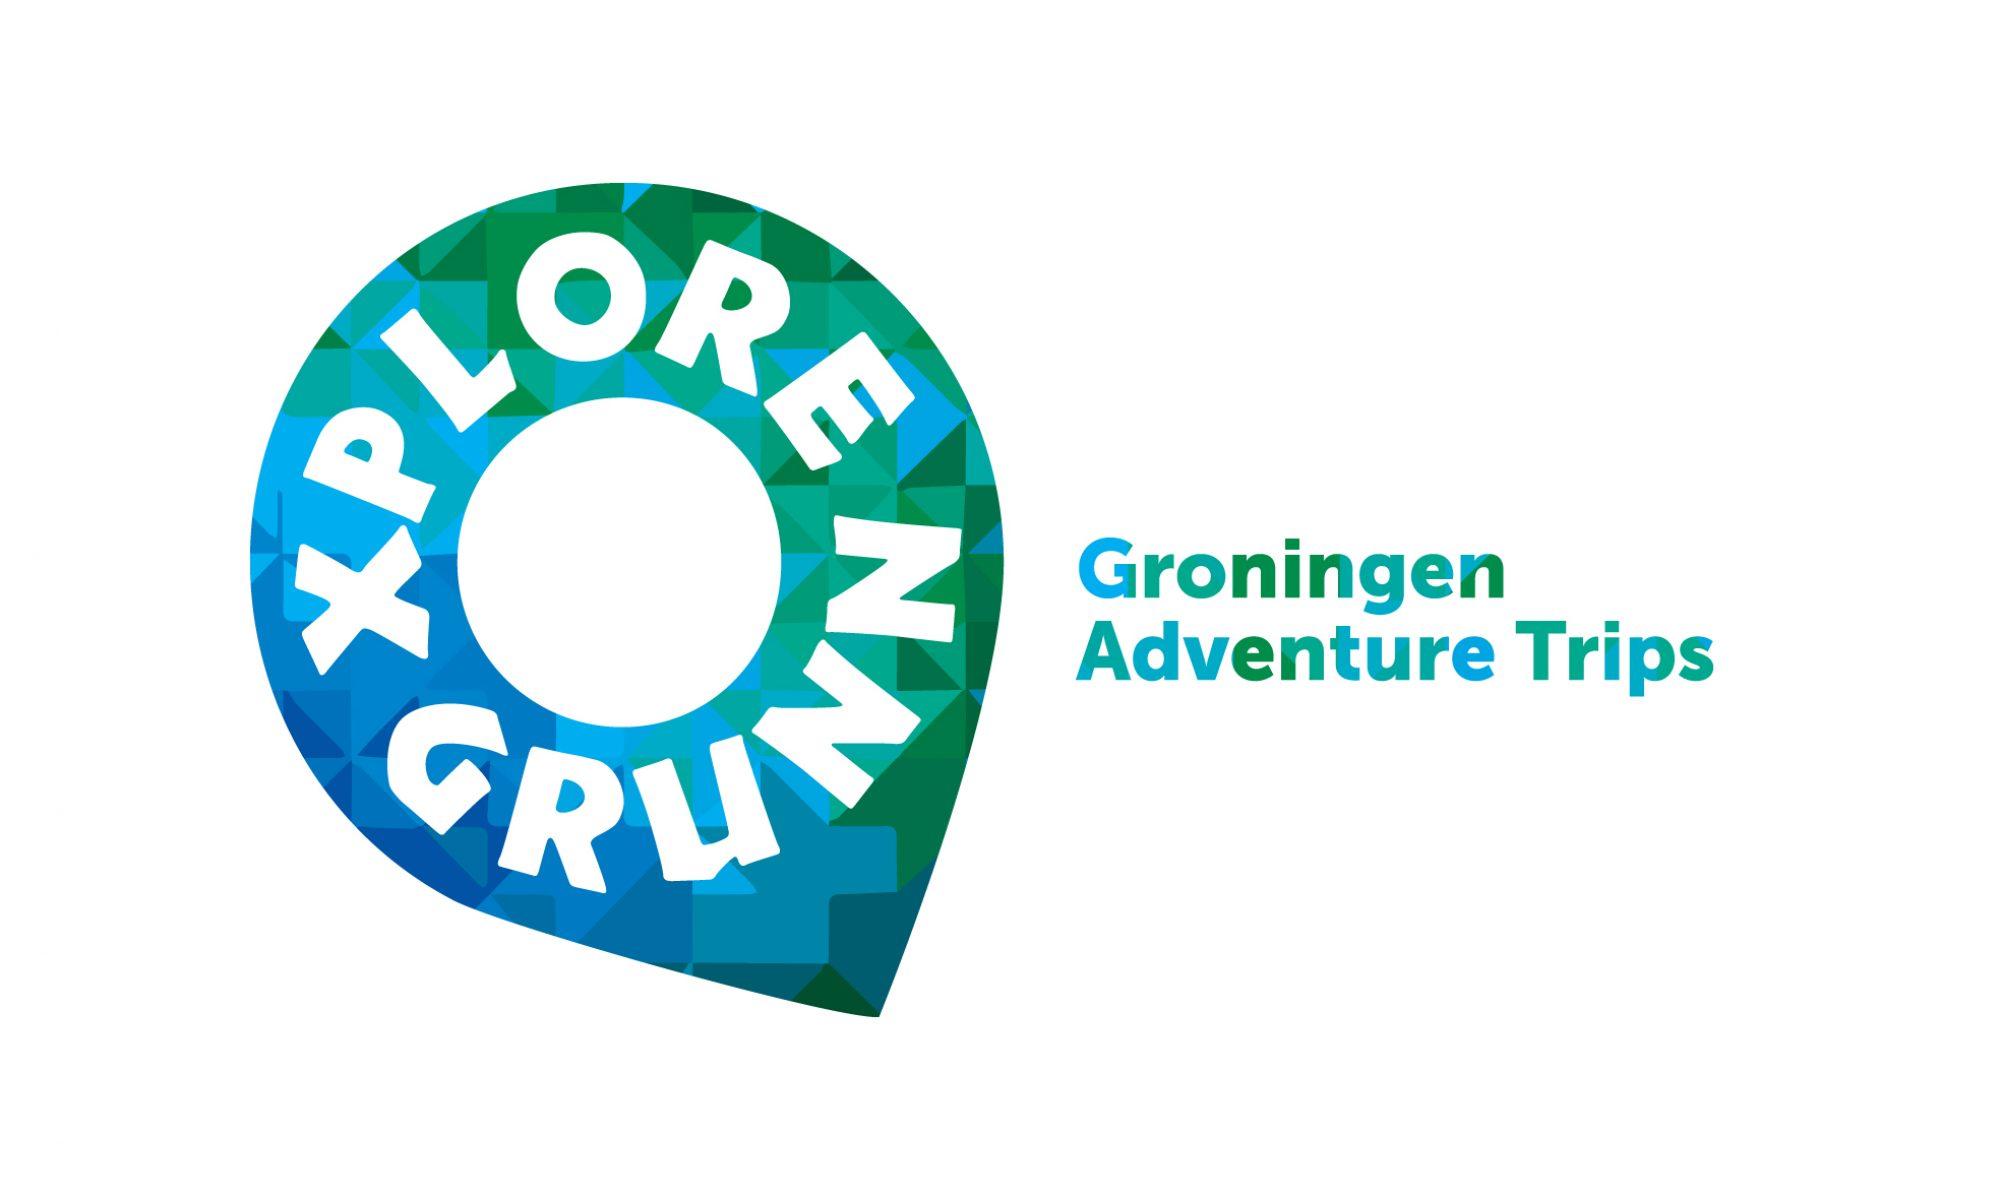 Xplore Grunn - Groningen Adventure Trips